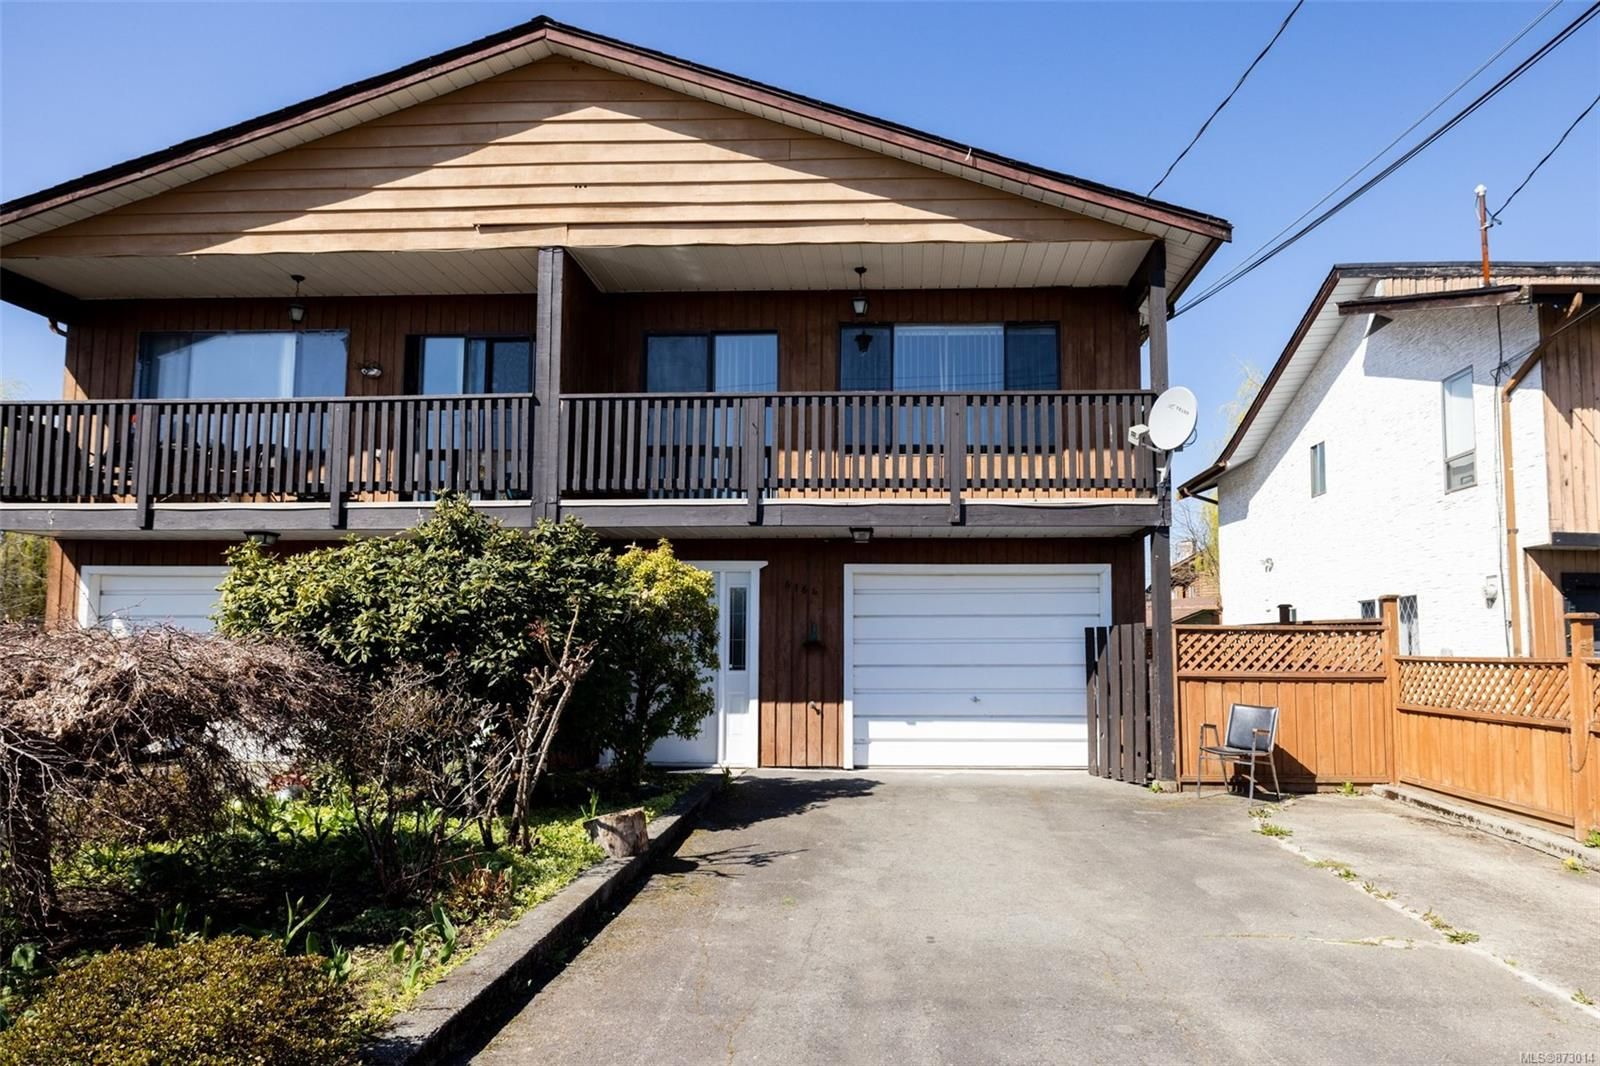 Main Photo: 6164 Somenos Rd in : Du West Duncan Half Duplex for sale (Duncan)  : MLS®# 873014